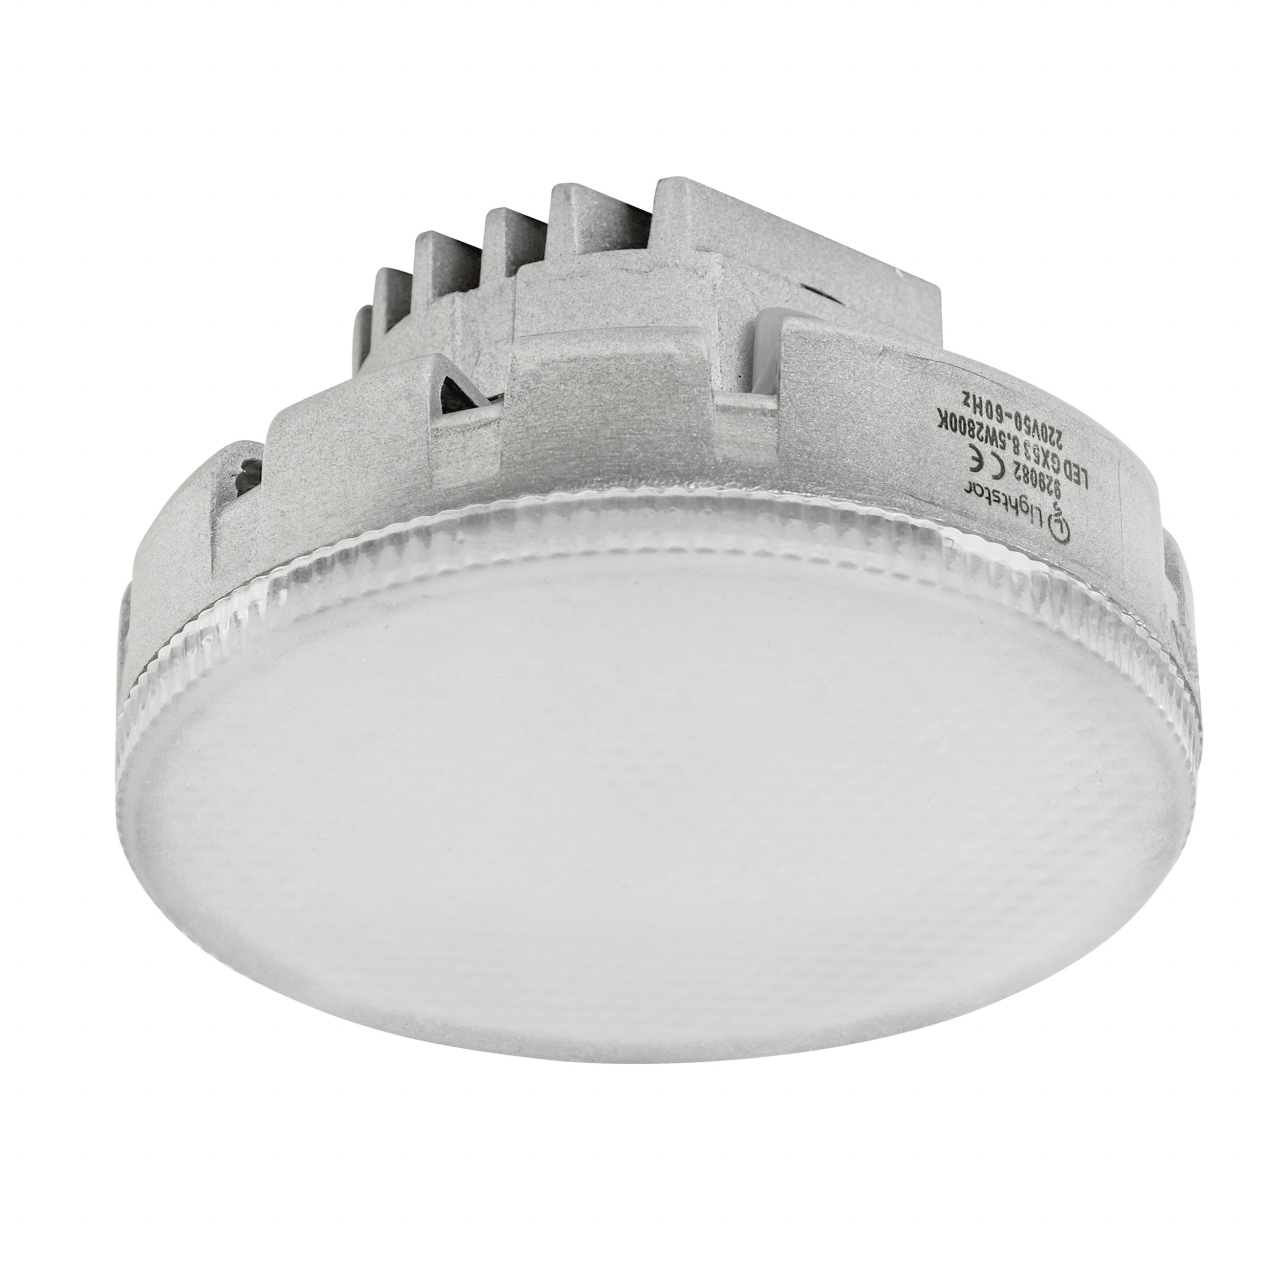 Лампа LED 220V TABL GX53 12W=120W 960LM 180G FR 3000K 20000H Lightstar 929122